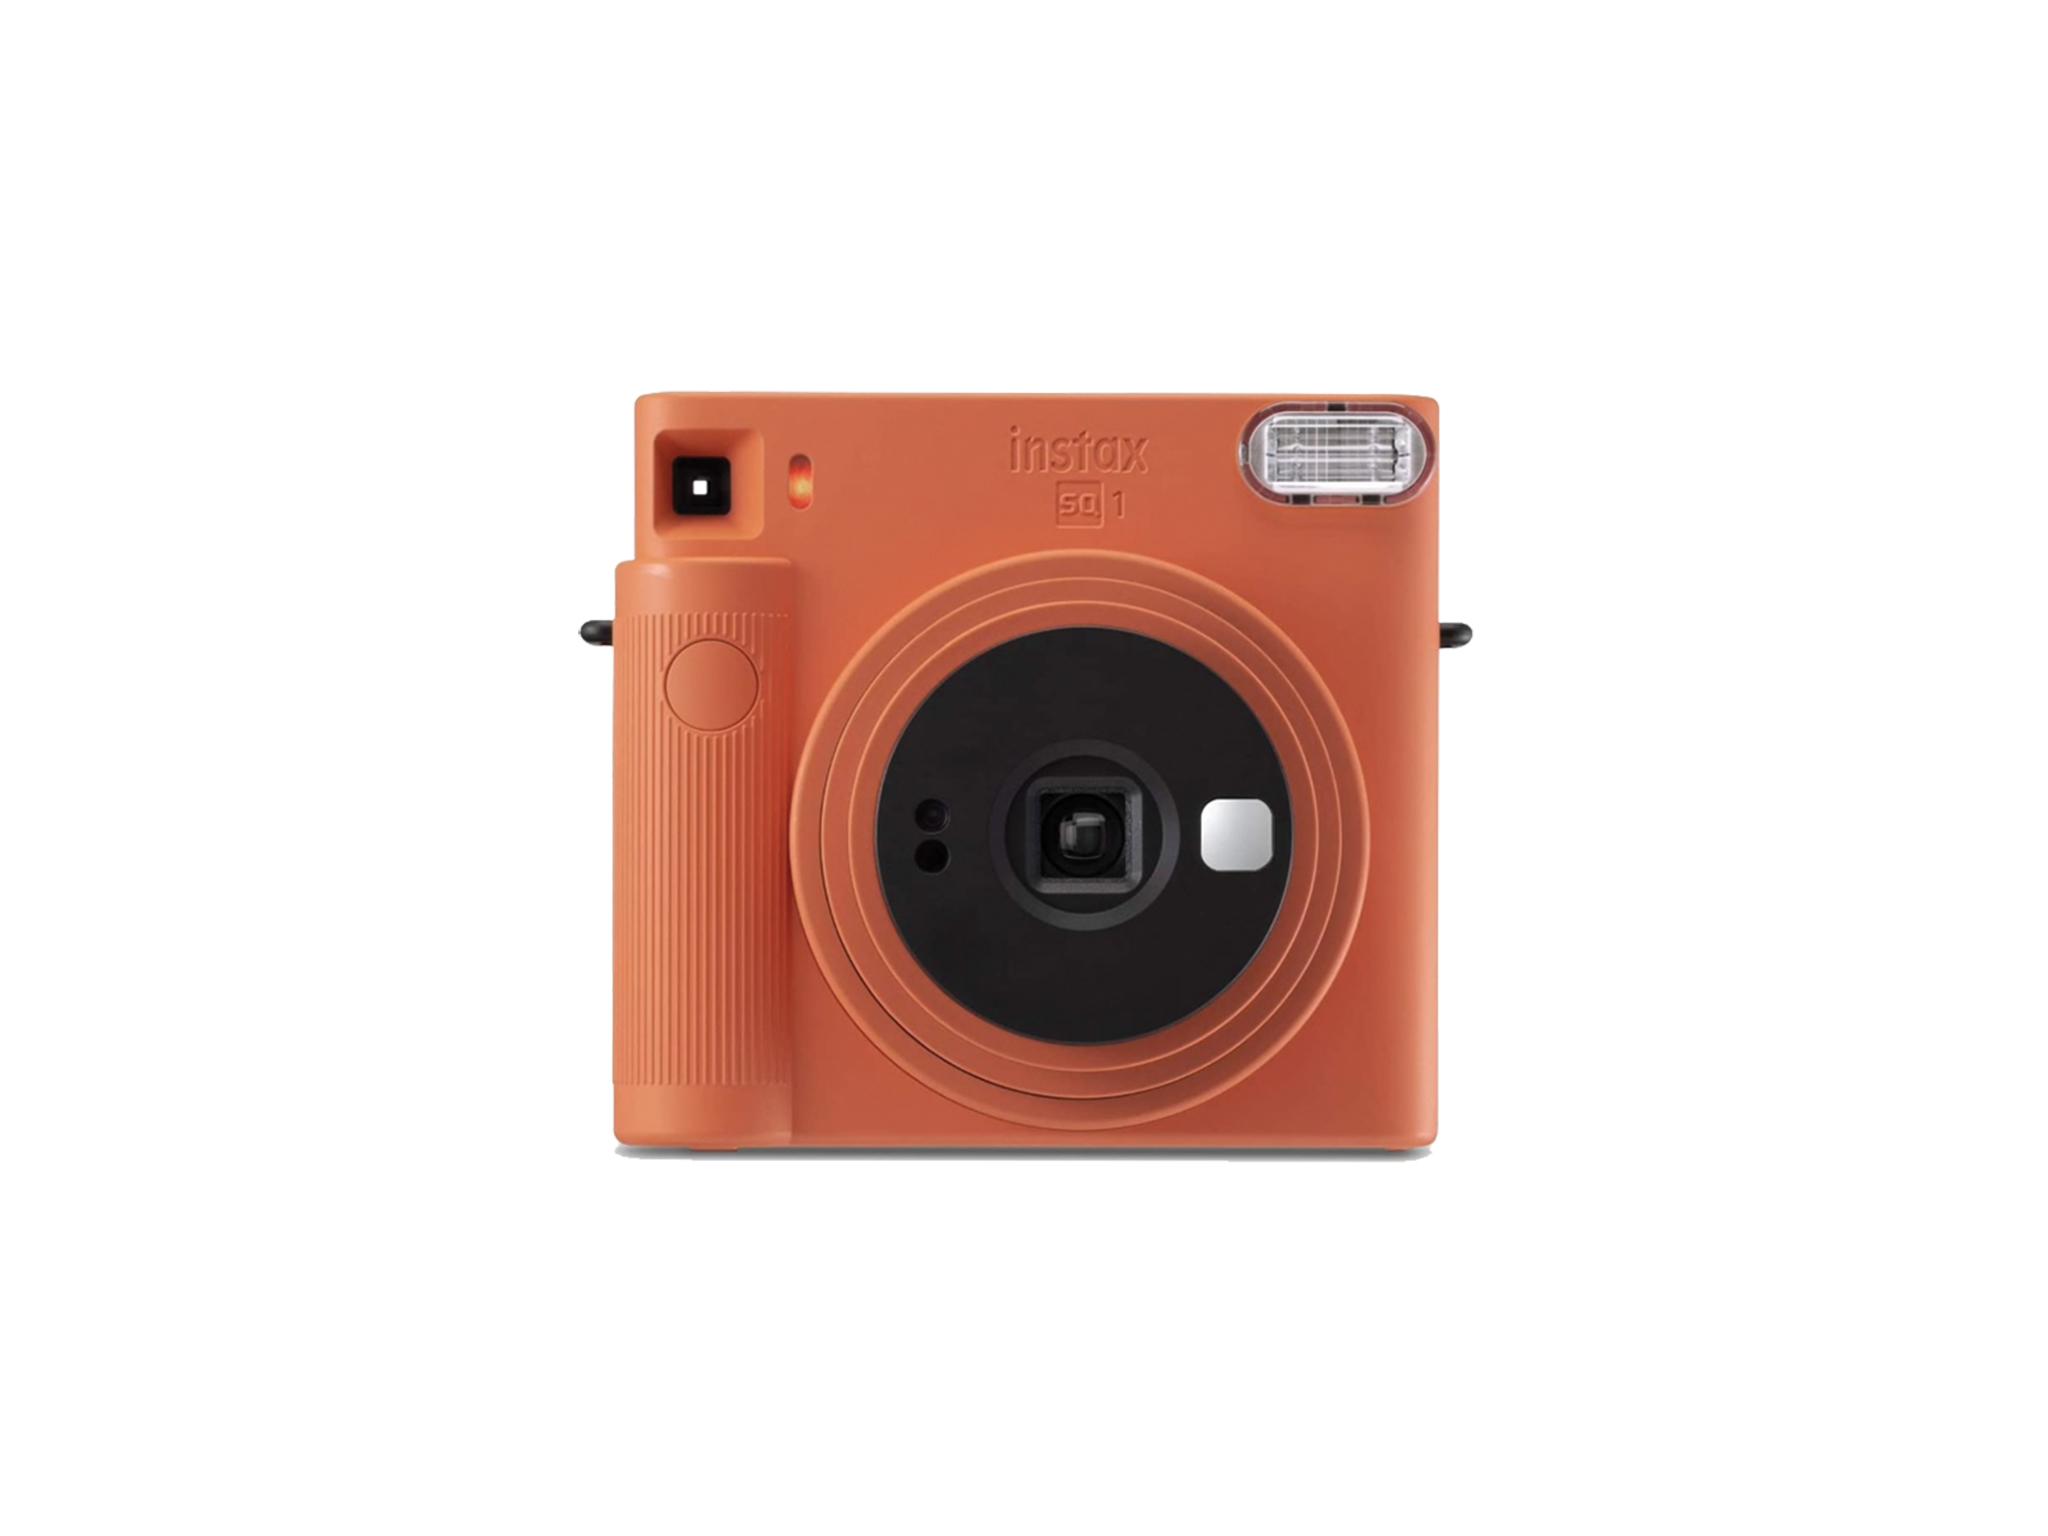 Compras, Shopping Natal, Máquina fotográfica, Fujifilm Instax SQ1